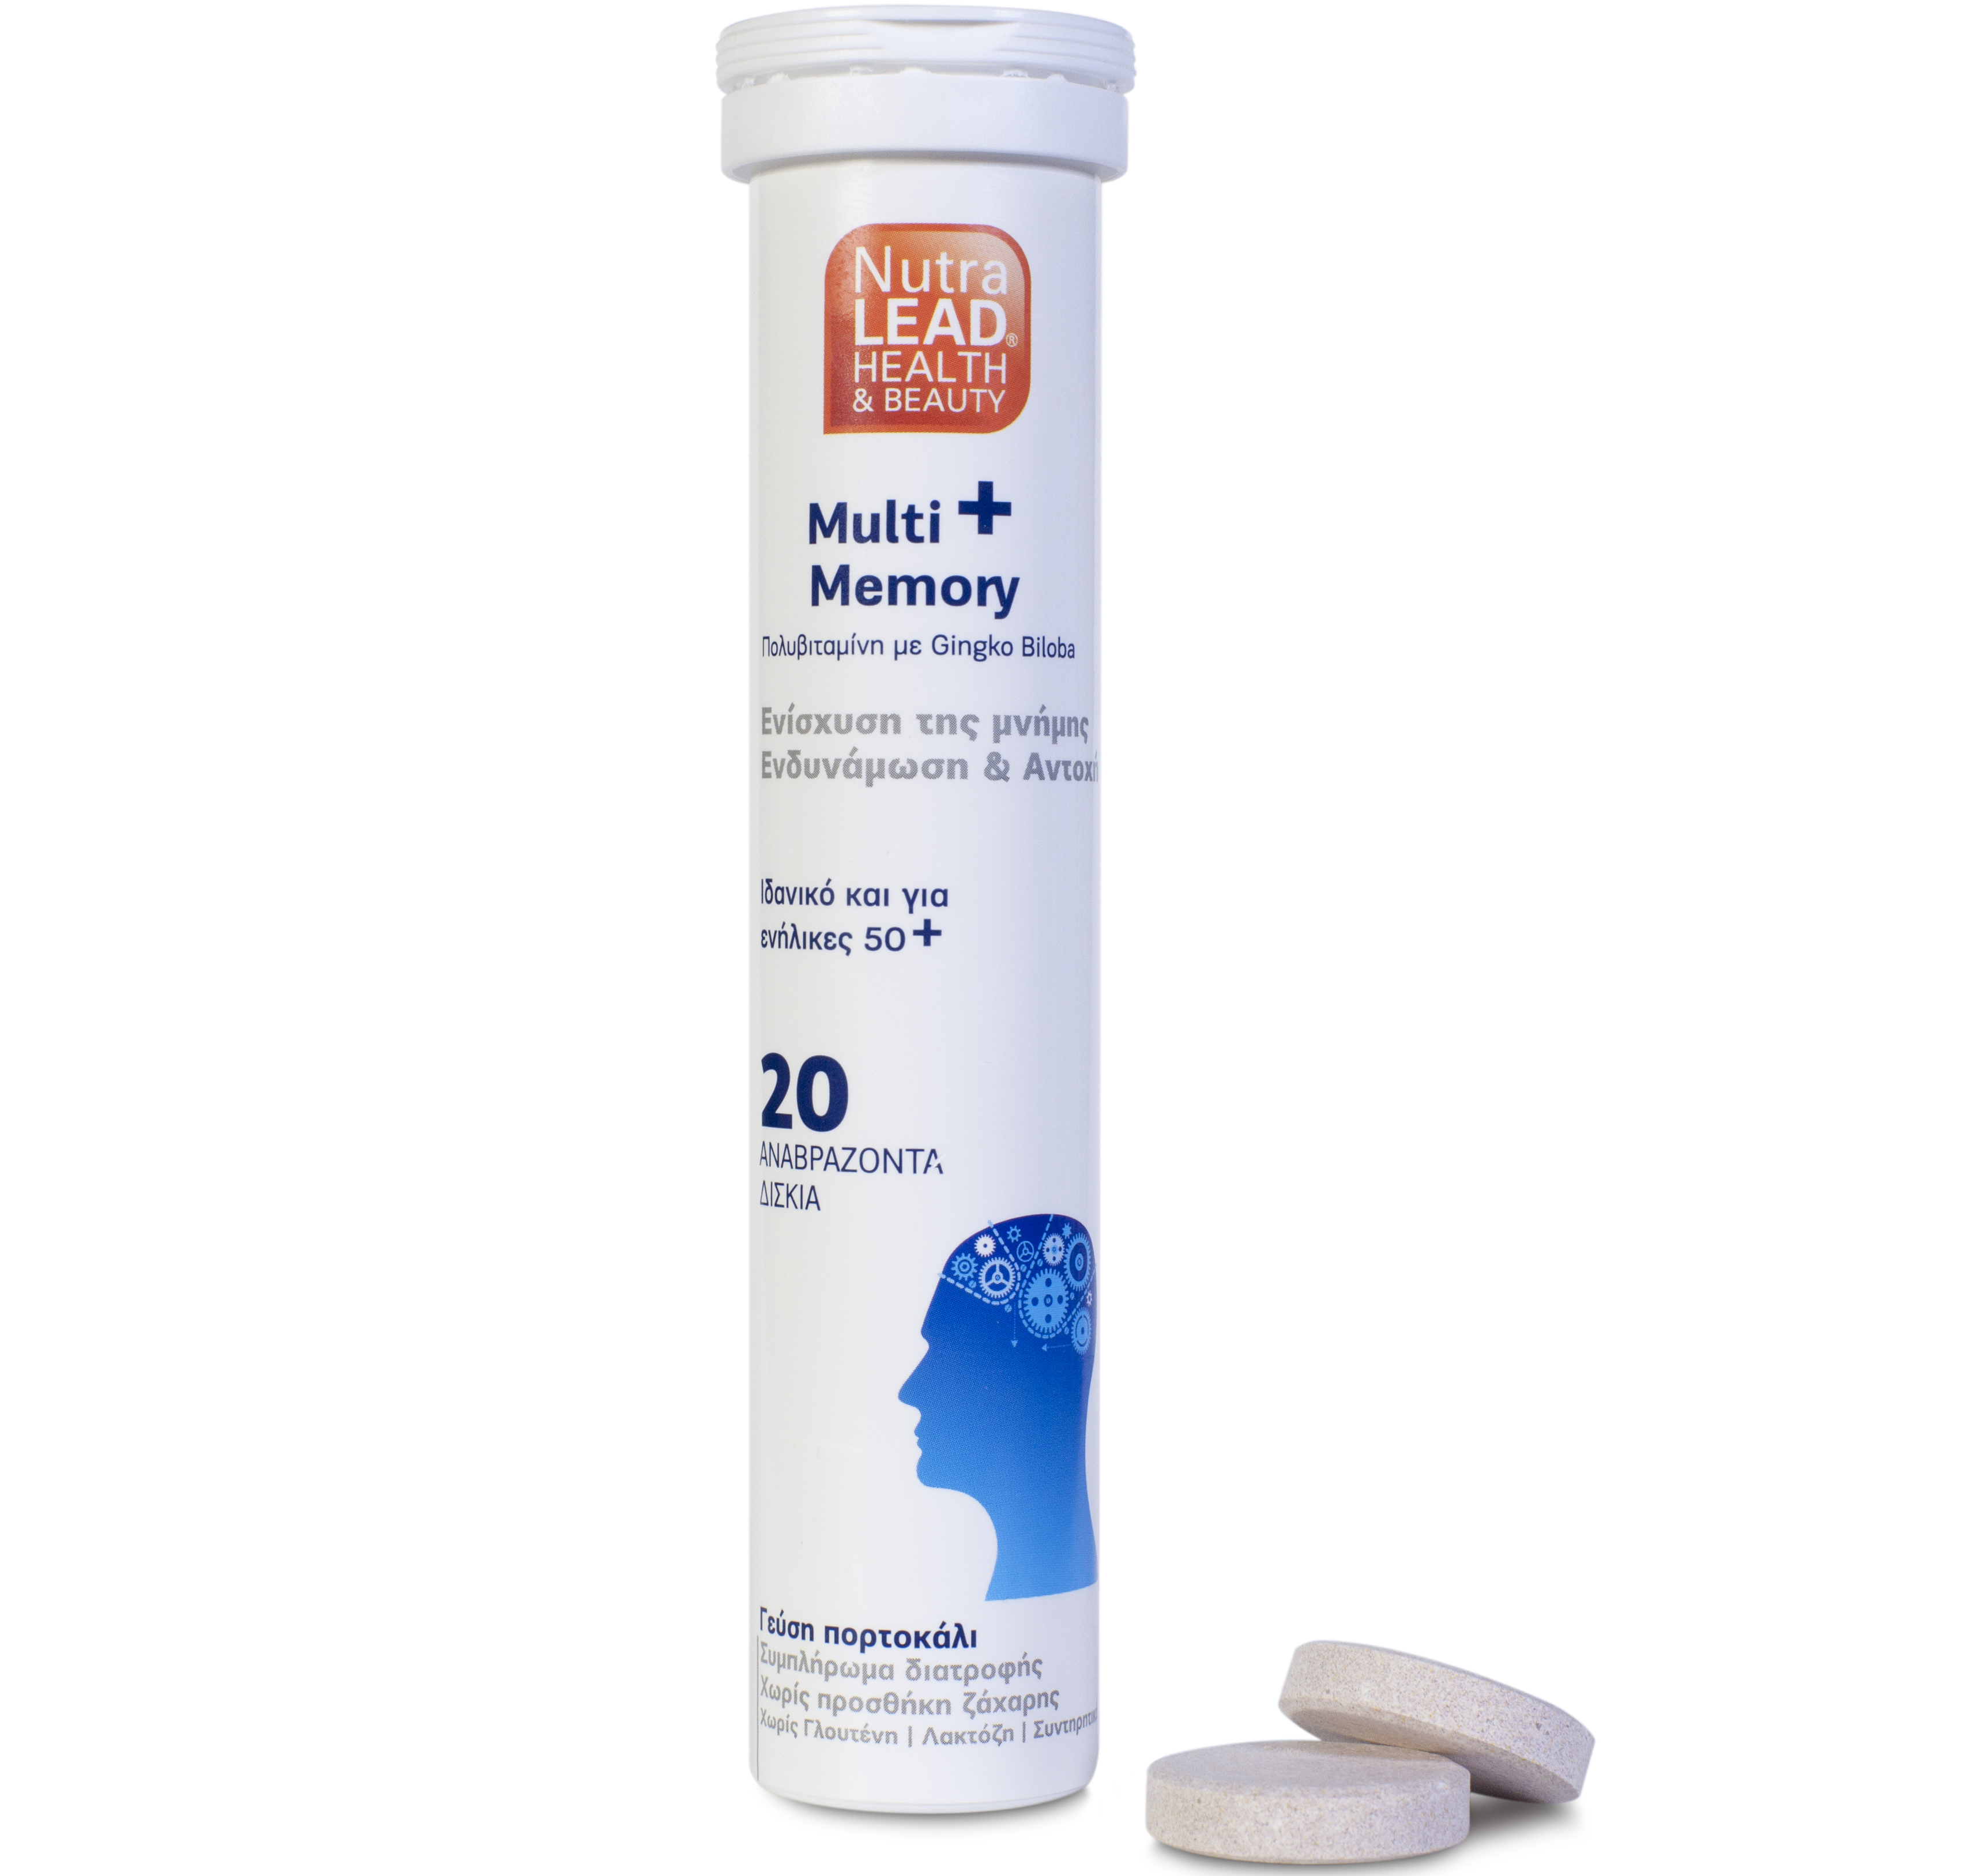 Nutralead Multi+ Memory με Gingko Biloba Πολυβιταμίνη για Ενήλικες 50+ Ετών για την Ενίσχυση της Μνήμης 20tabs